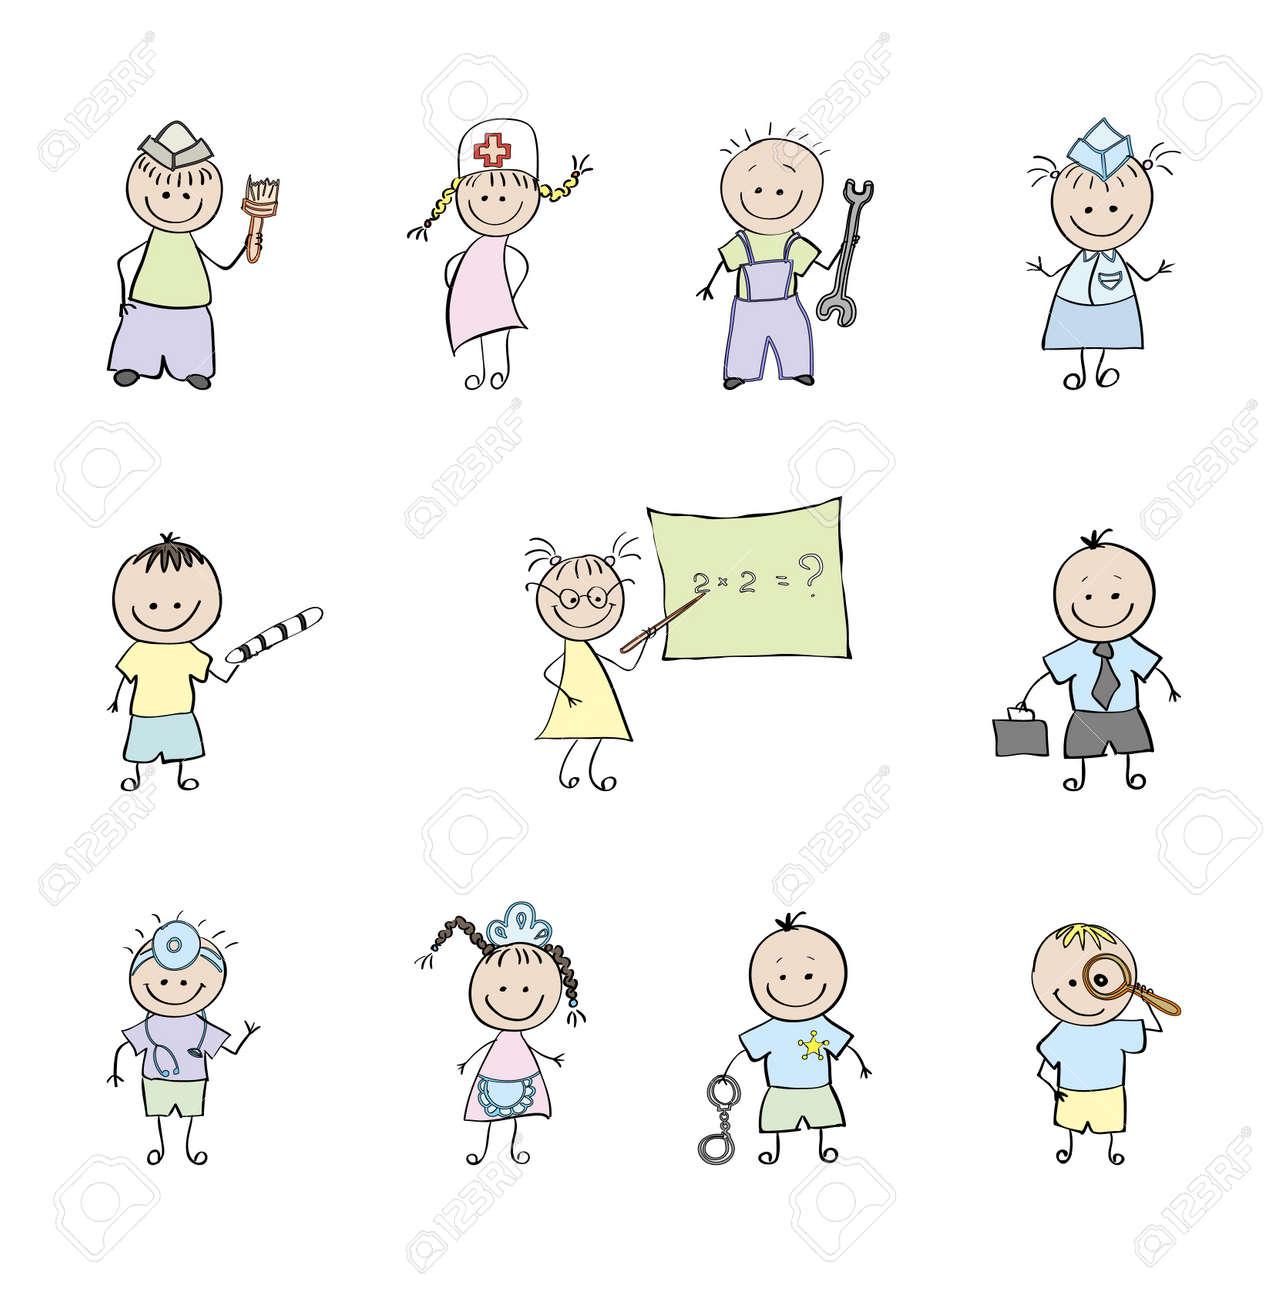 10 professionals who choose children. Vector illustration. Stock Vector - 10057139